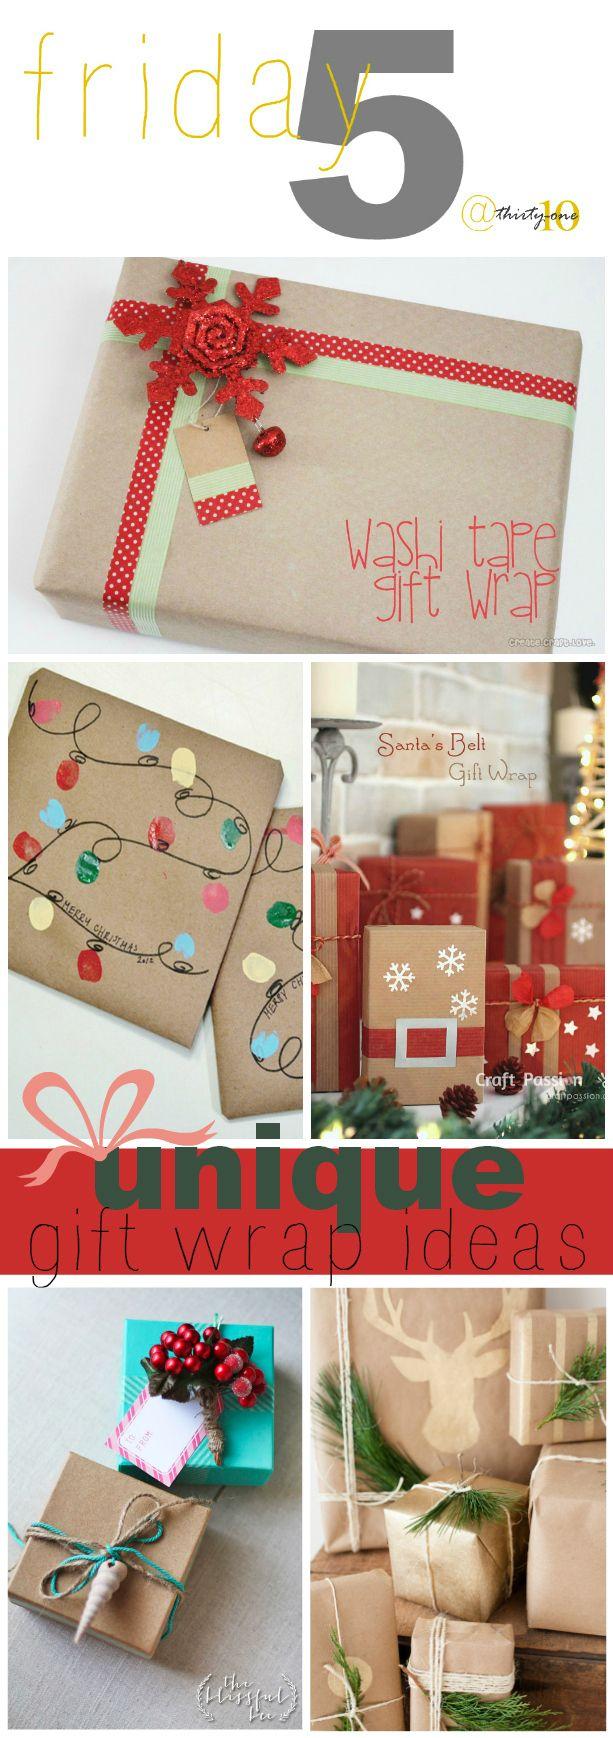 5 Unique Gift Wrap Ideas and Tutorials